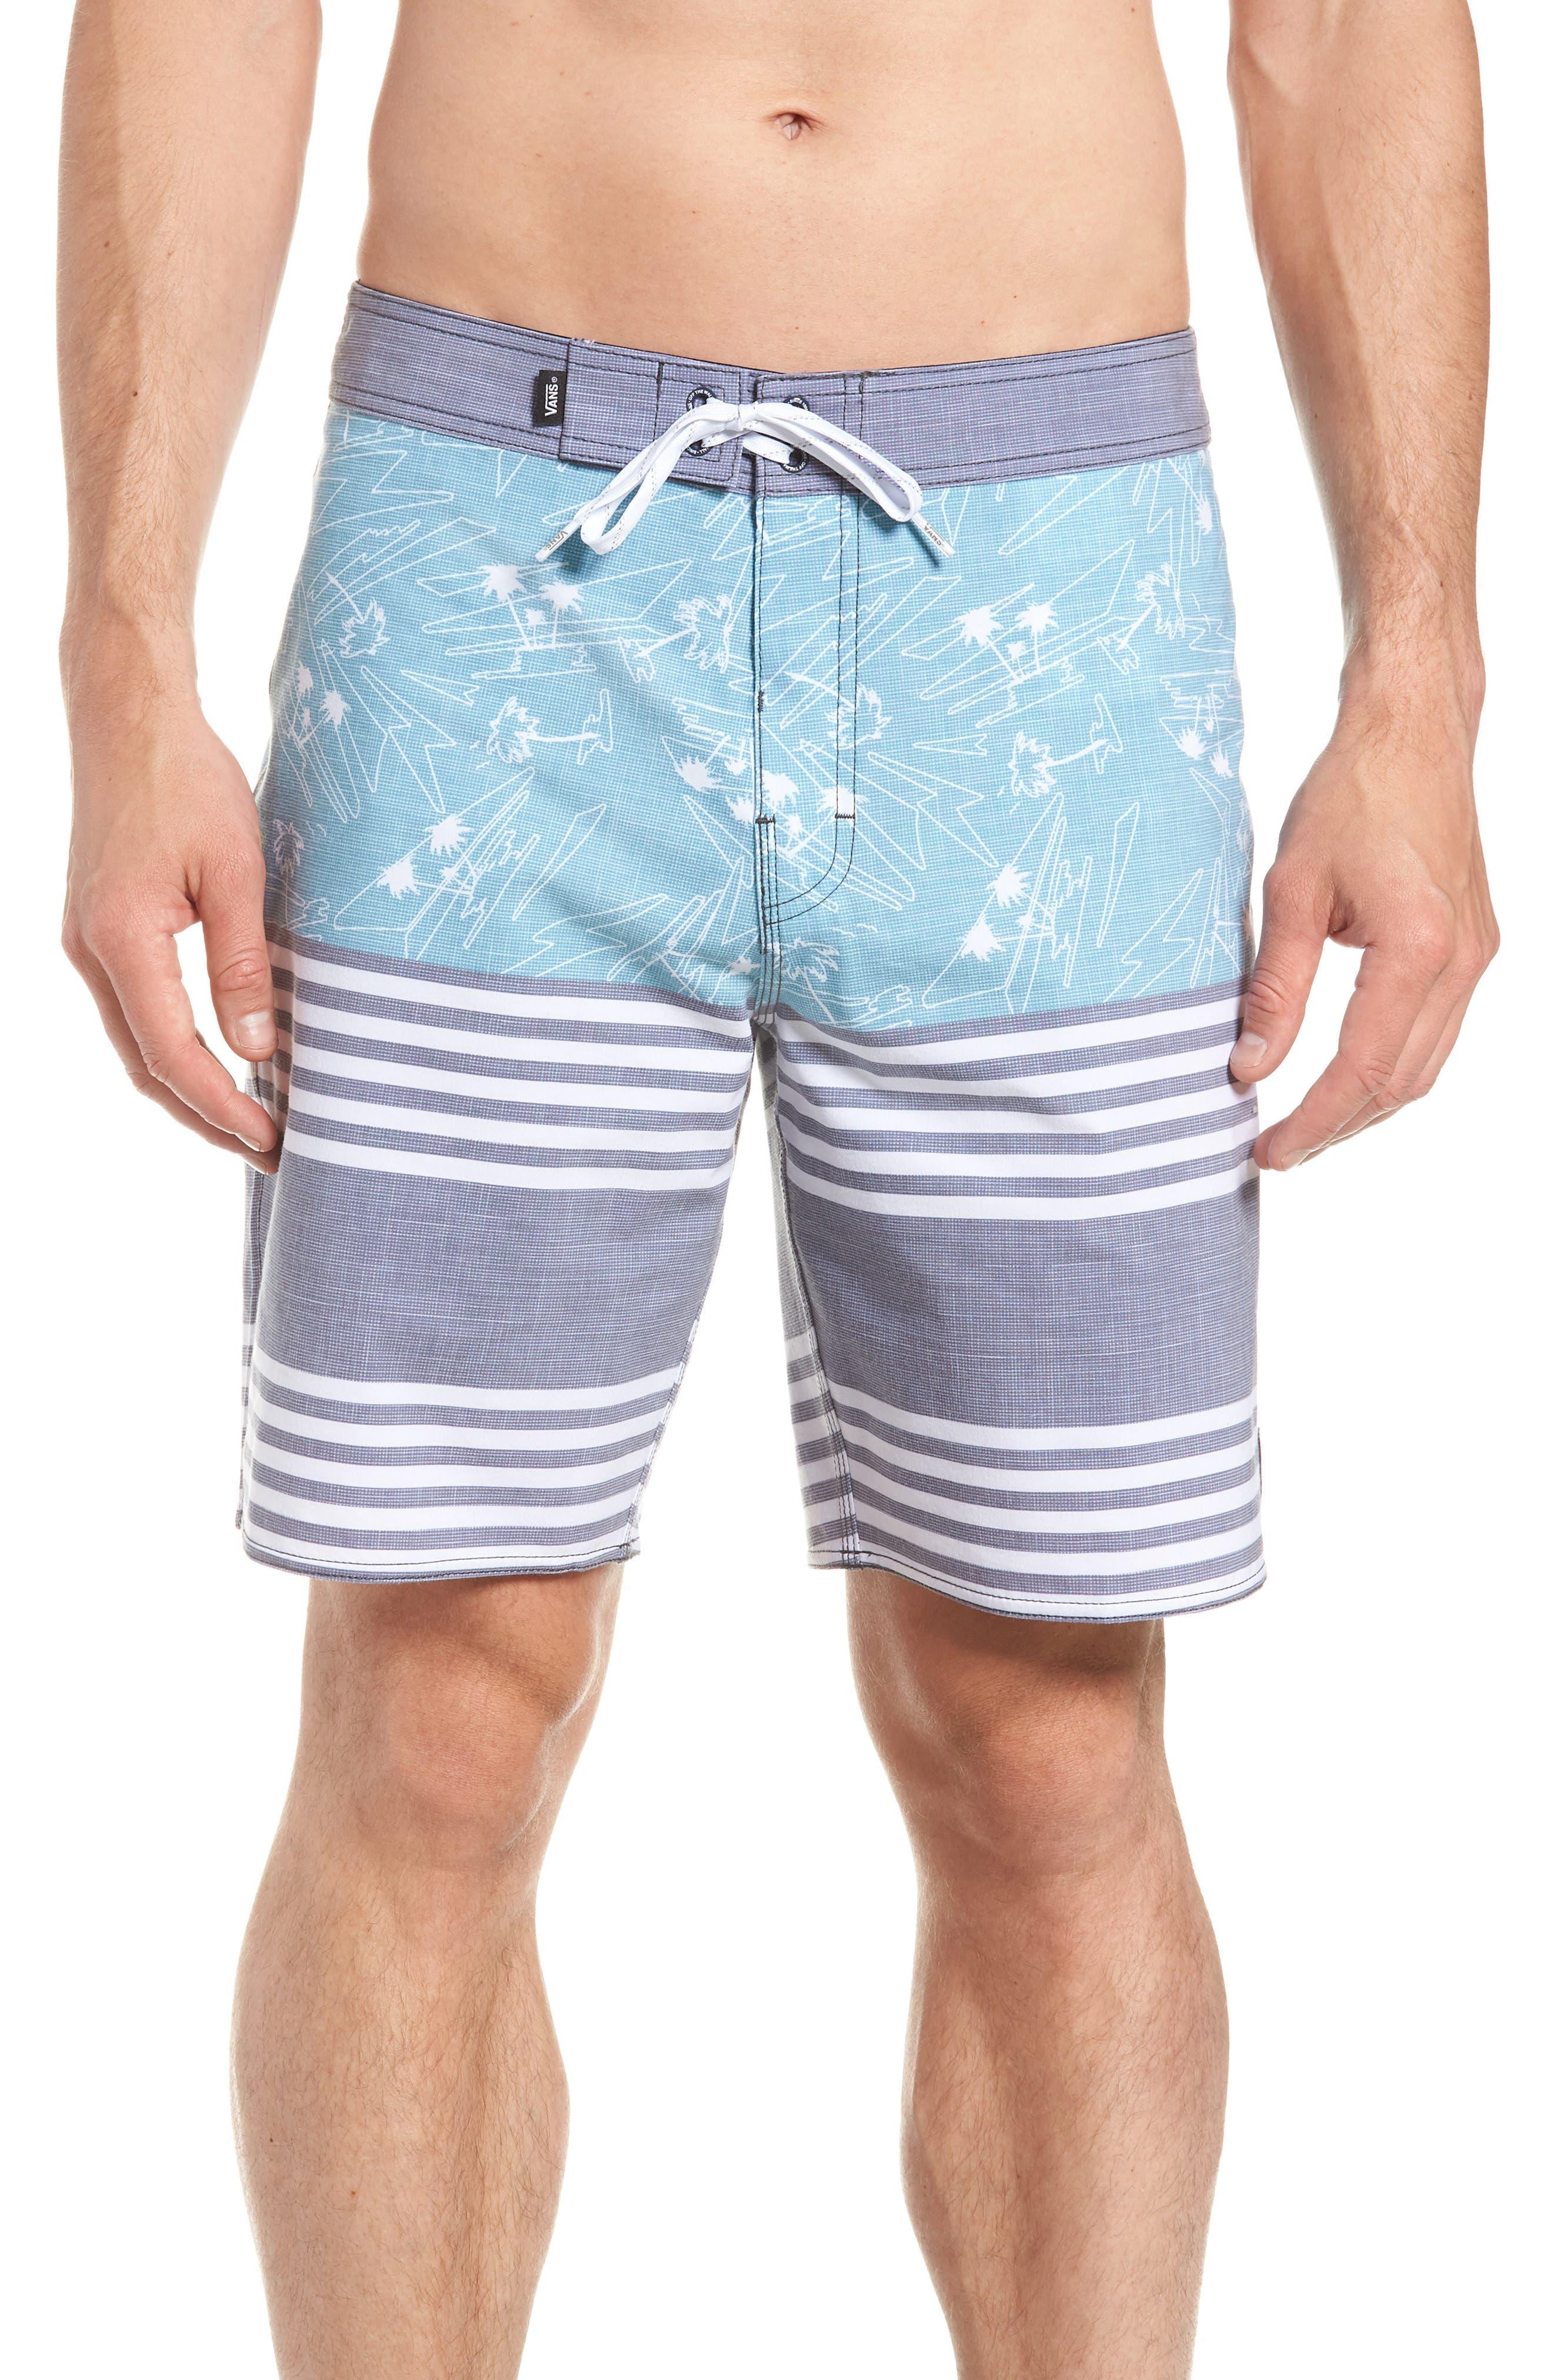 Era Board Shorts,                         Main,                         color, DRESS BLUES ISLAND BEACH